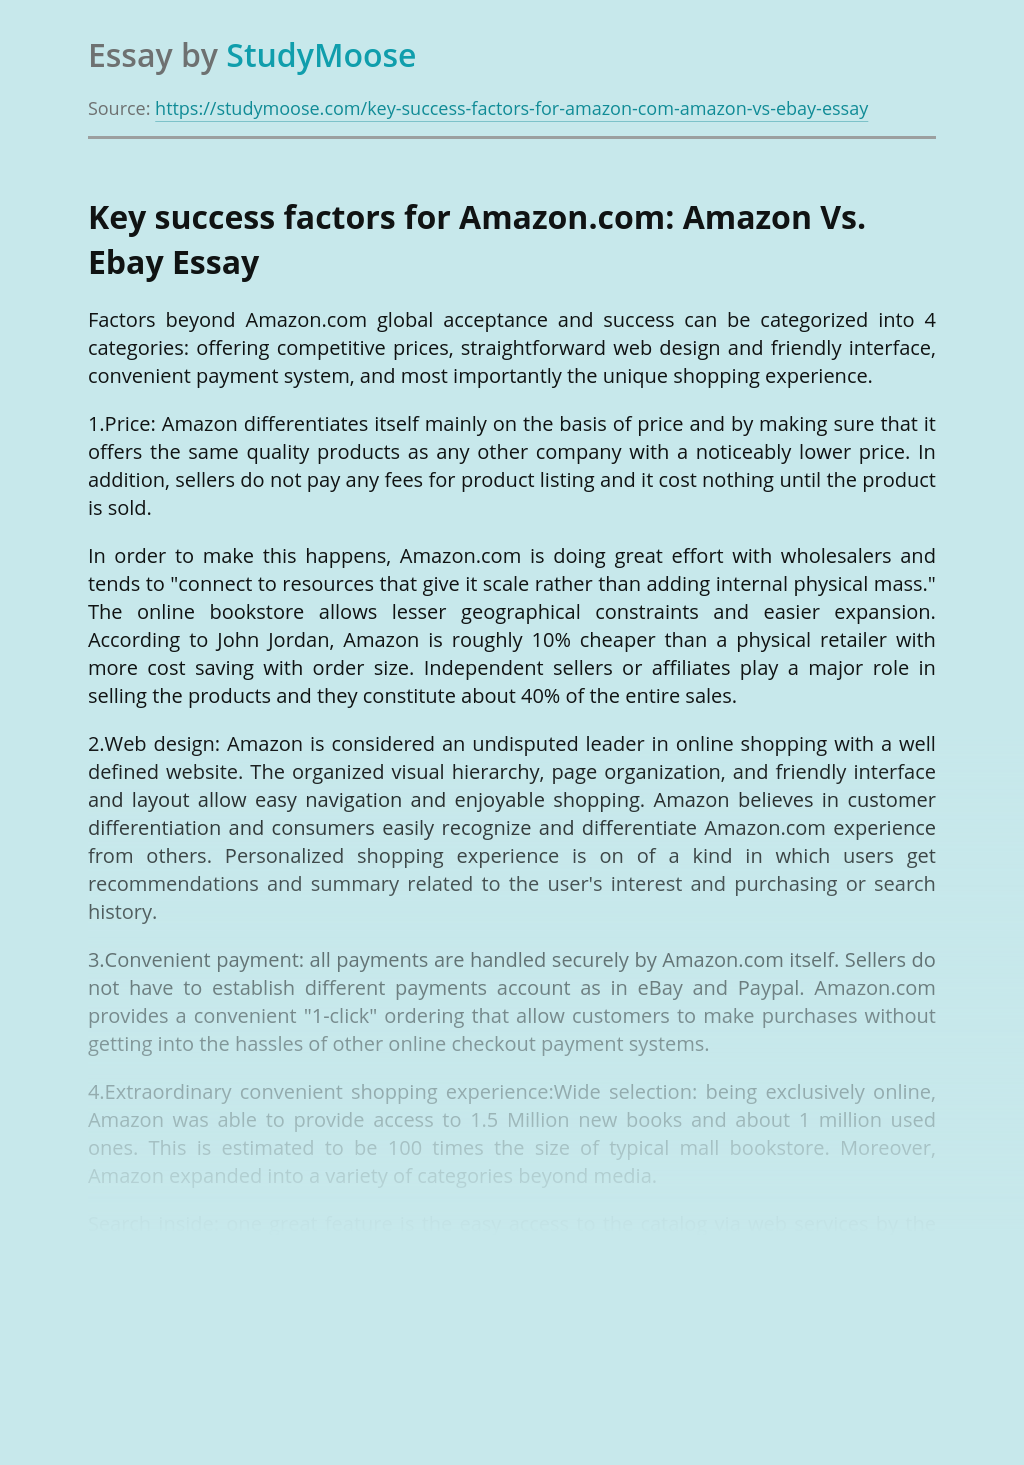 Key success factors for Amazon.com: Amazon Vs. Ebay